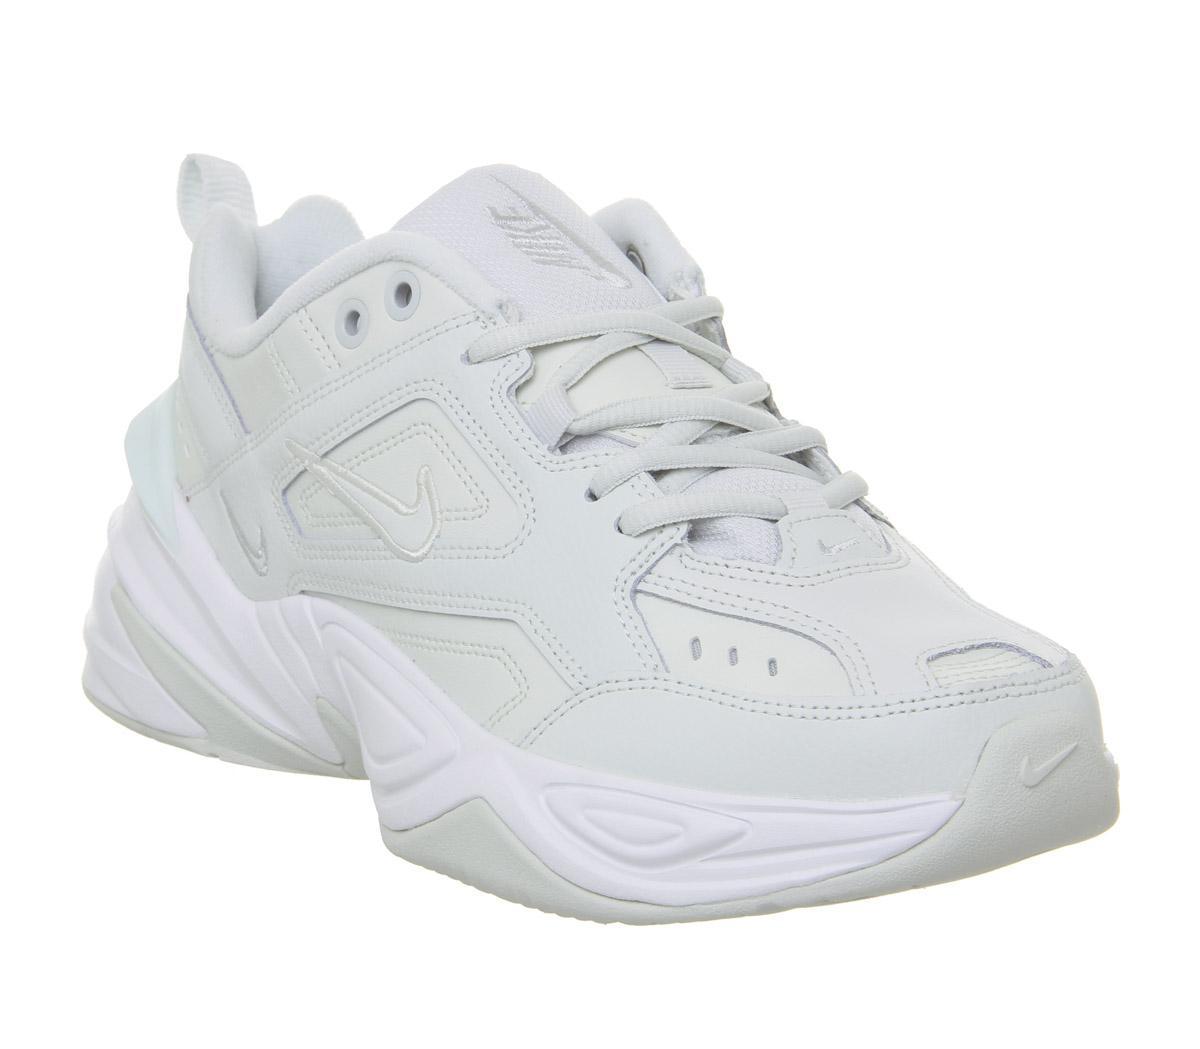 Nike M2k Tekno Trainers Spruce Aura